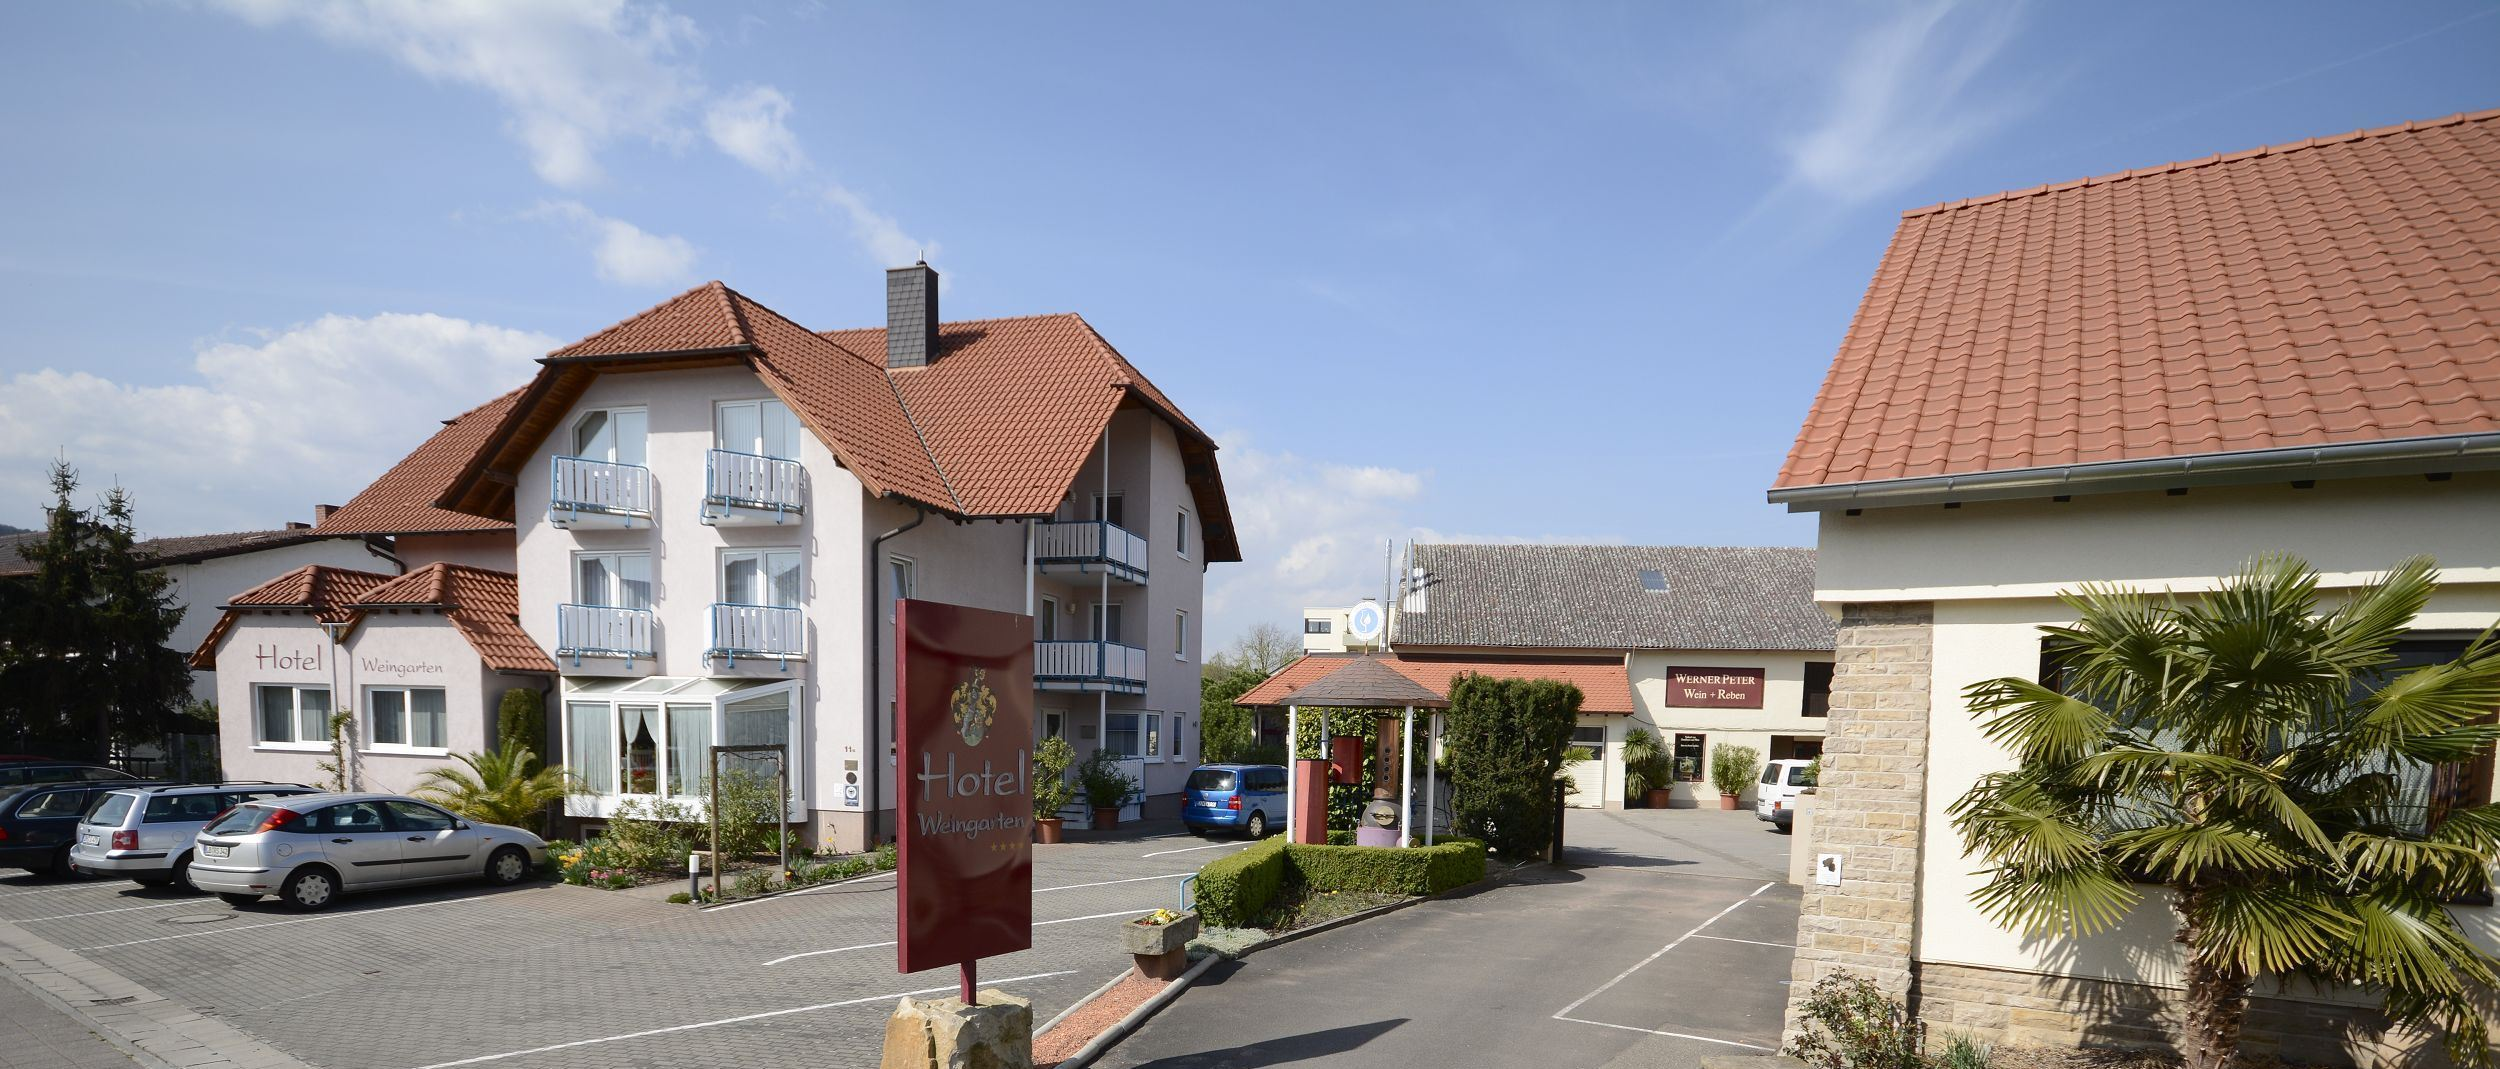 Hotel Weingarten in Bad Dürkheim – HOTEL DE